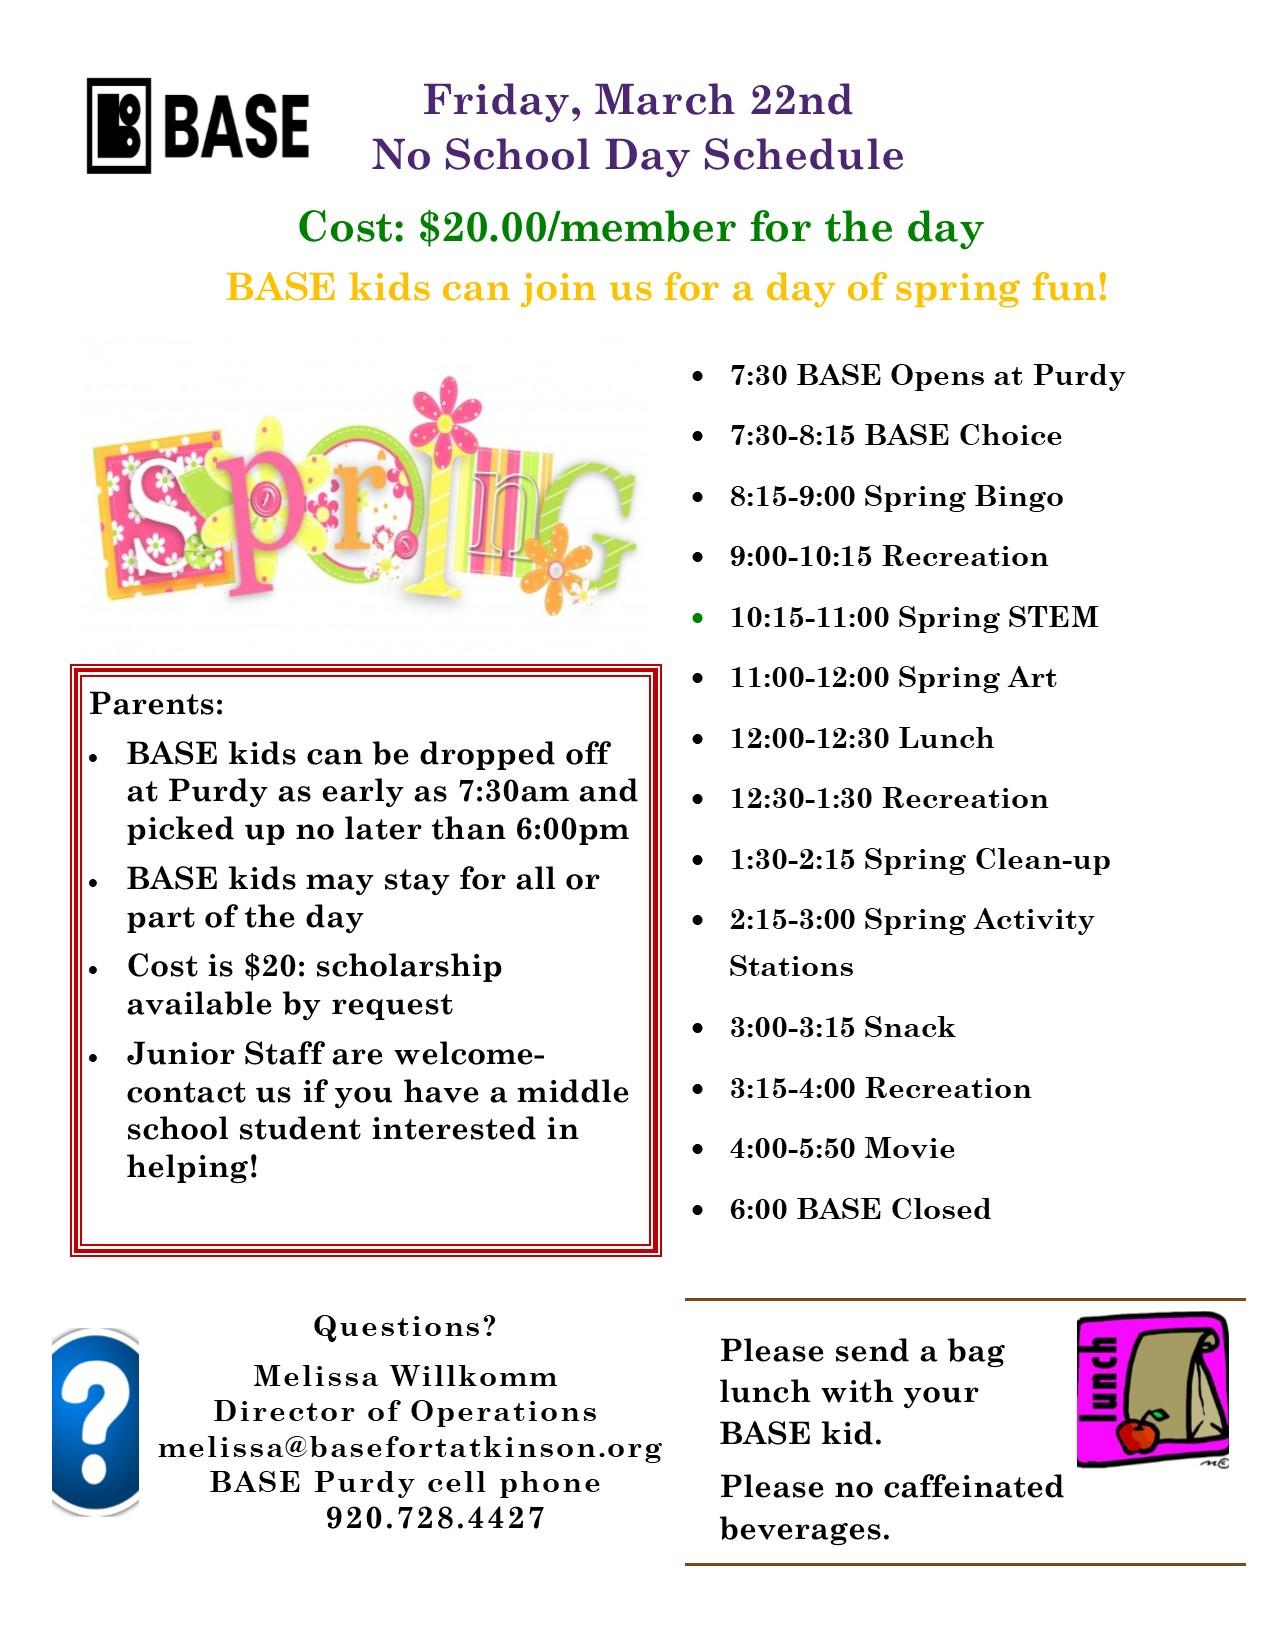 No School Day Schedule 3.22.19.jpg